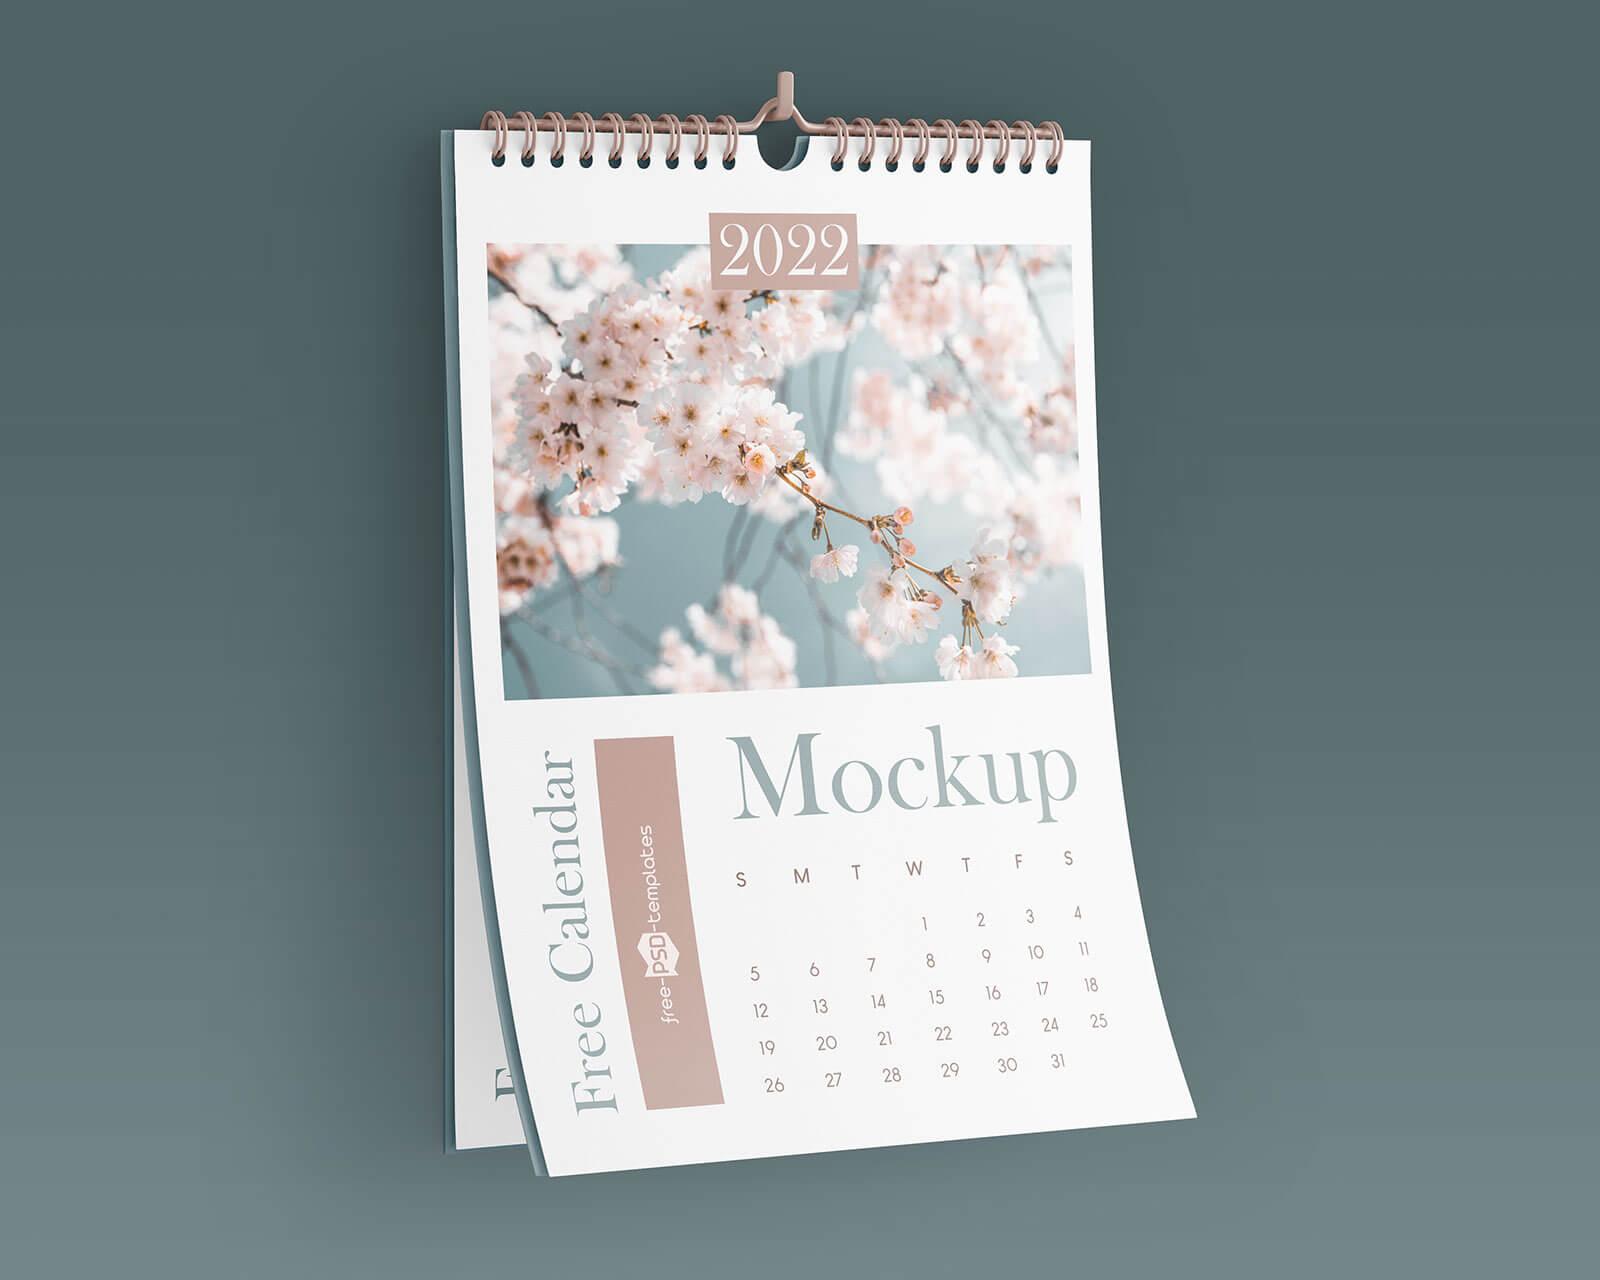 Free Portrait Wall Calendar 2022 Mockup PSD